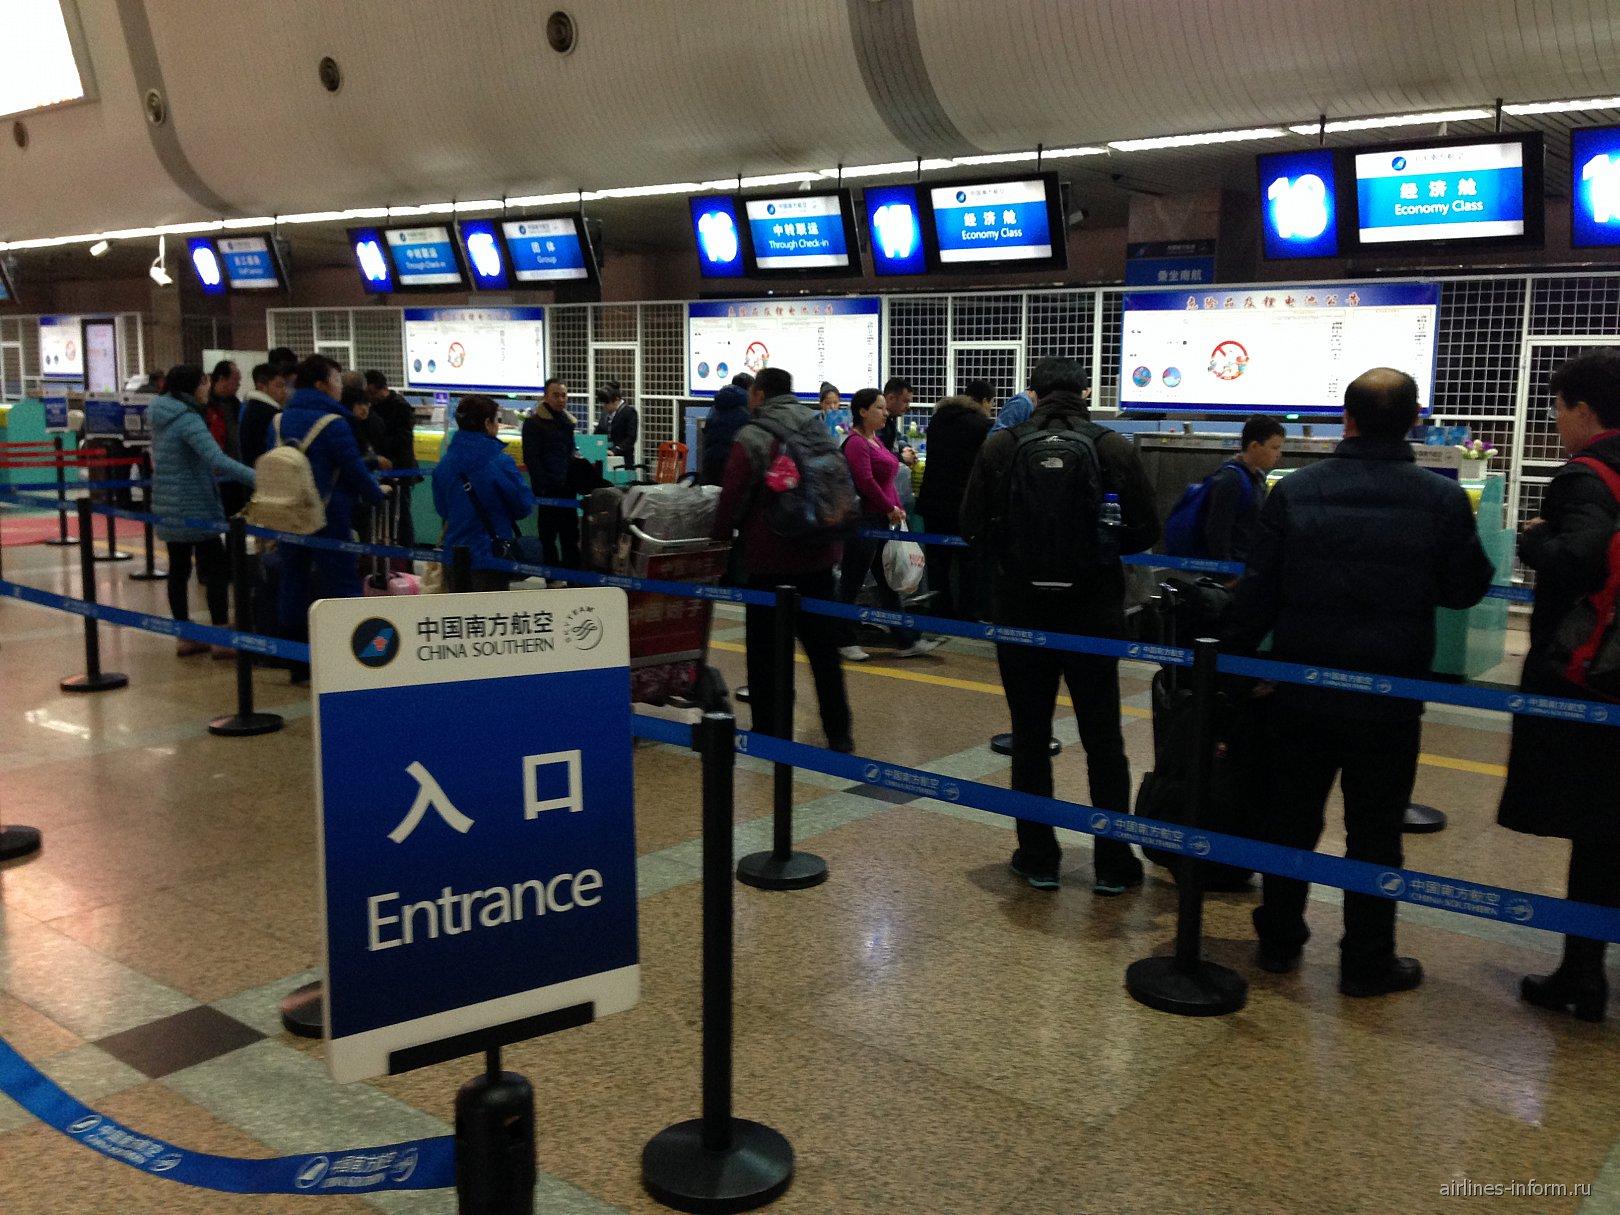 Стойки регистрации авиакомпании China Southern Airlines в аэропорту Харбина